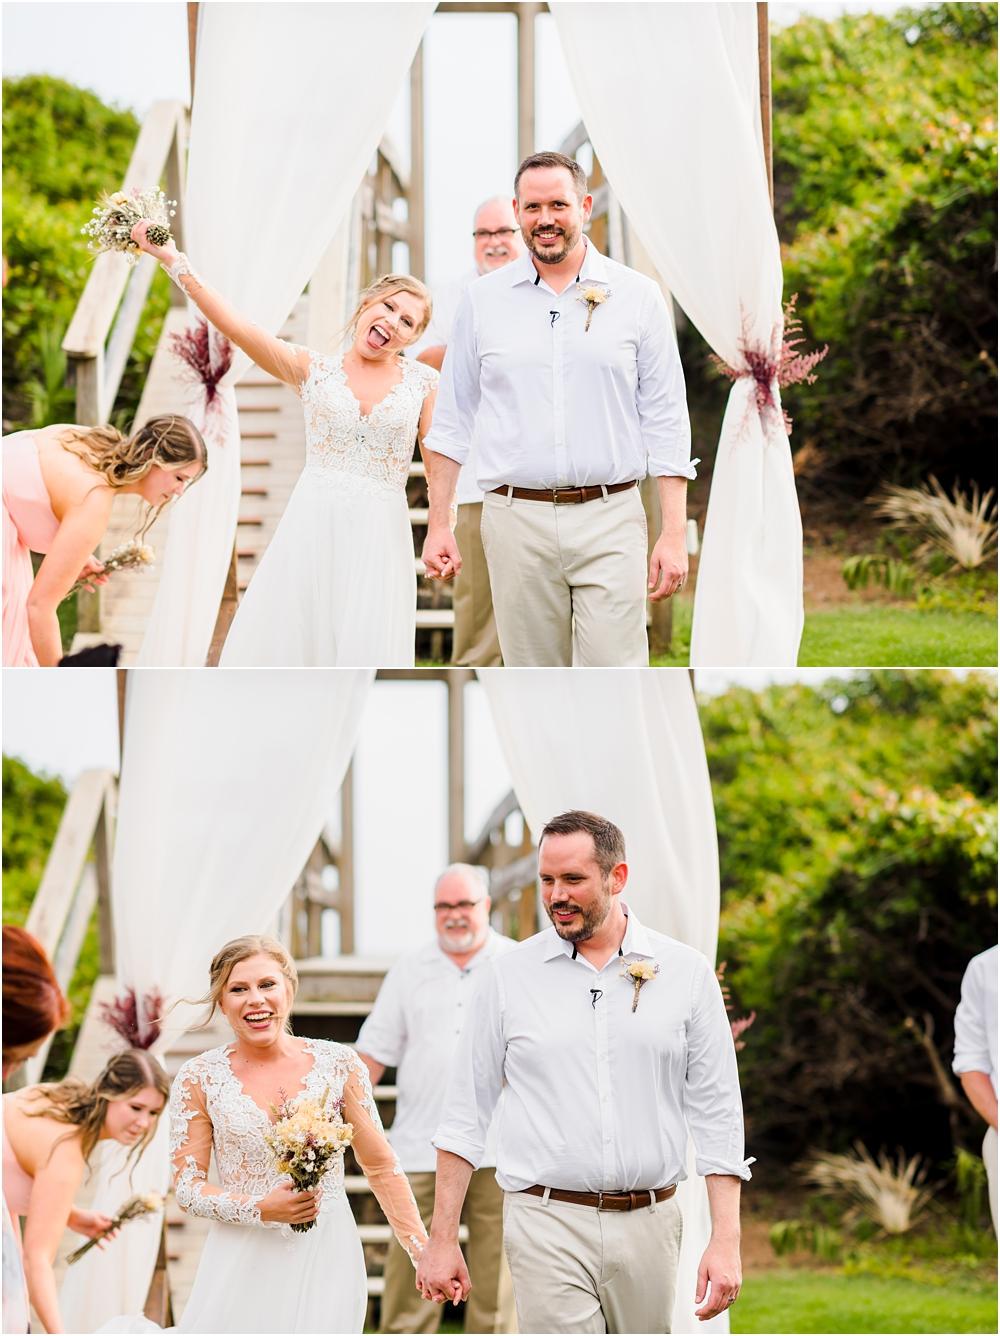 carrillo-triple-crown-santa-rosa-beach-florida-wedding-kiersten-stevenson-photography185.jpg